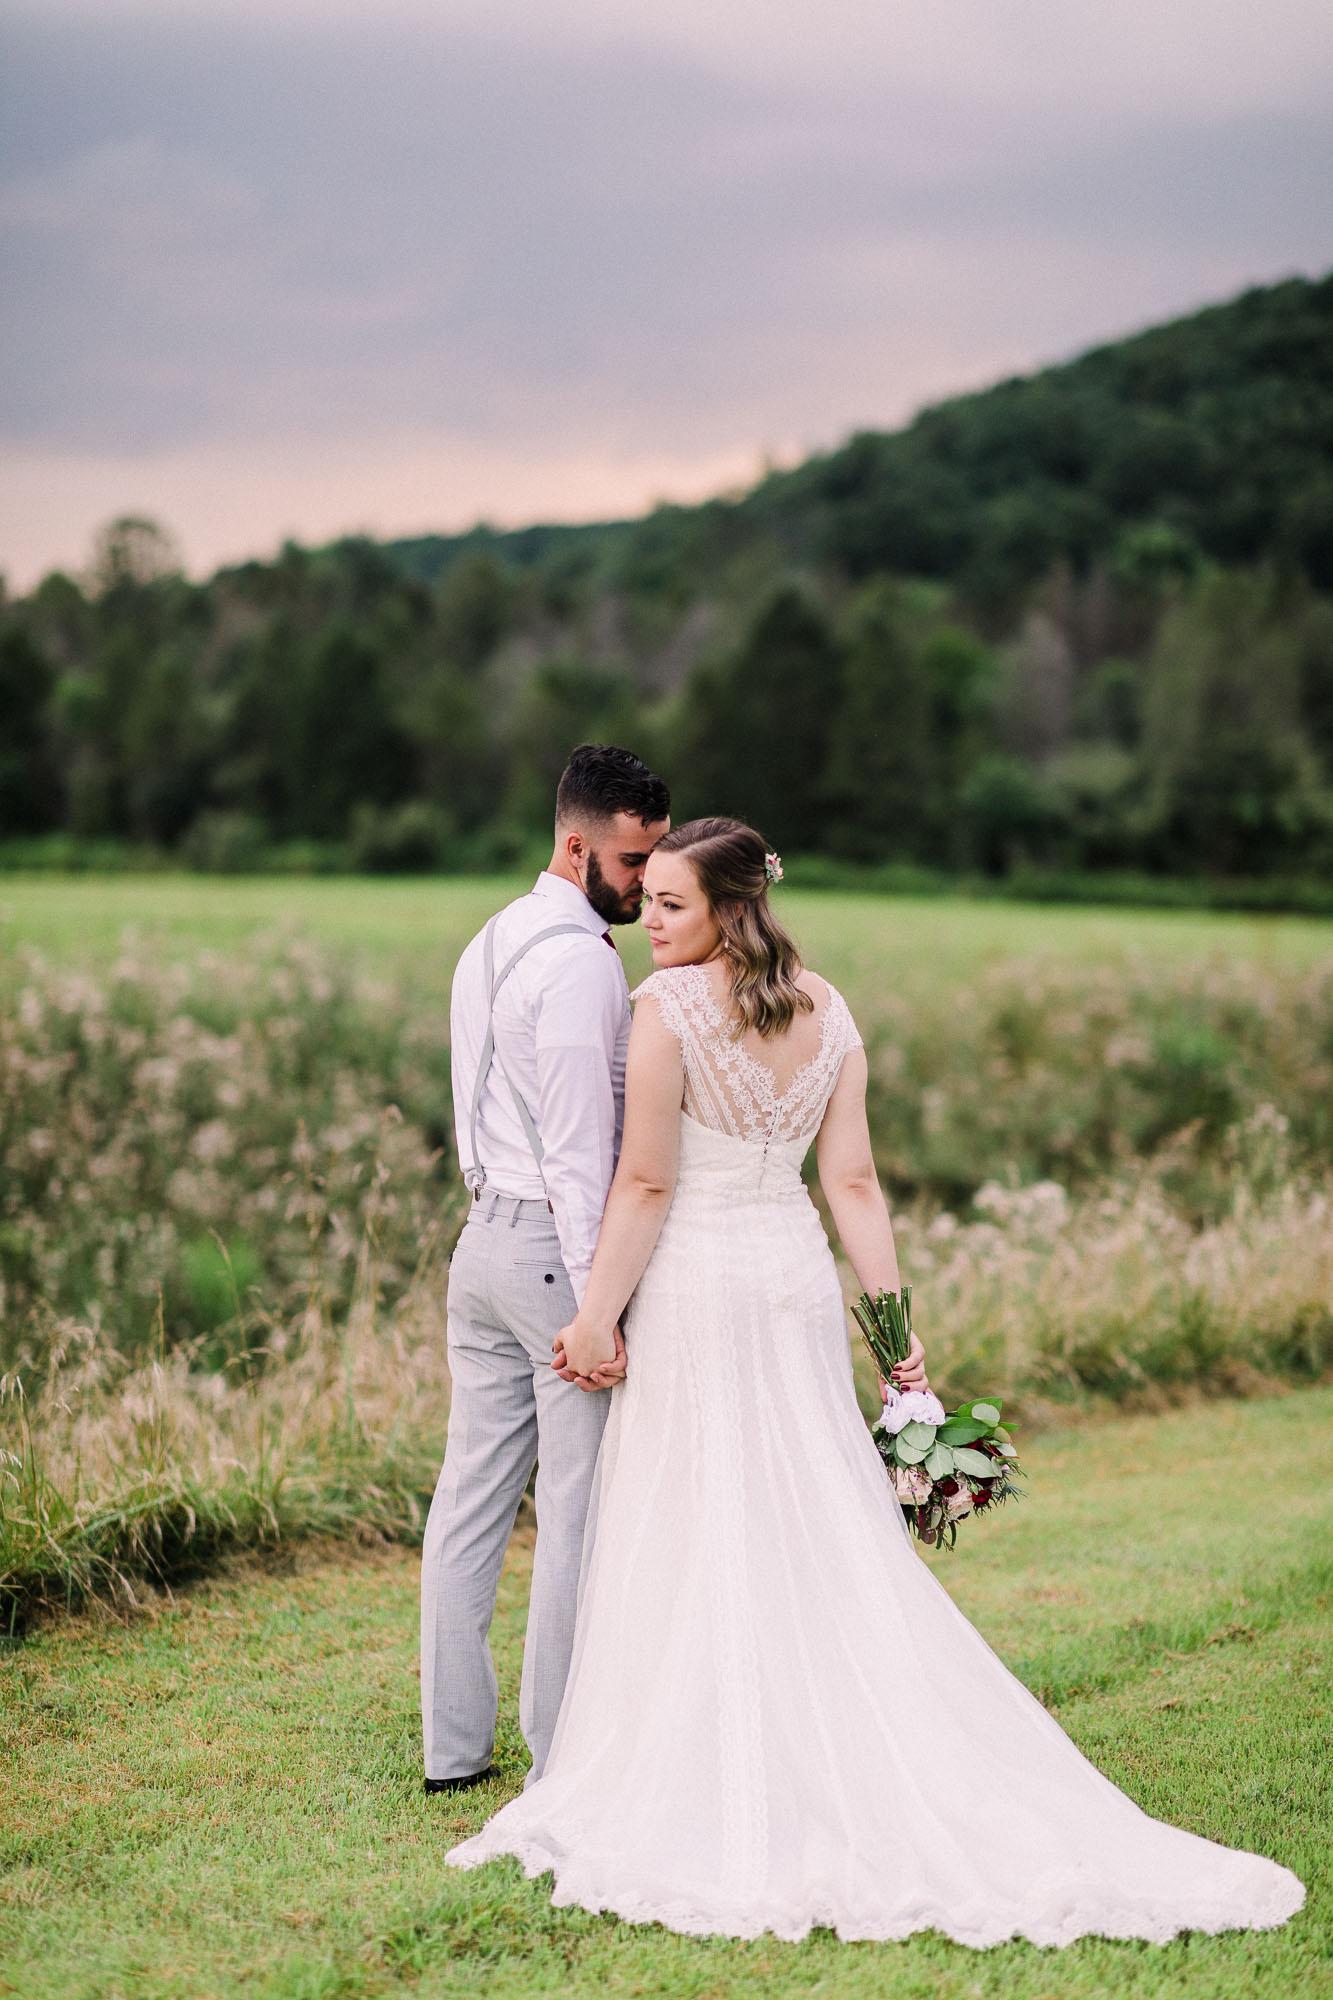 Stillwater-Christian_Church_Wedding-2293.jpg